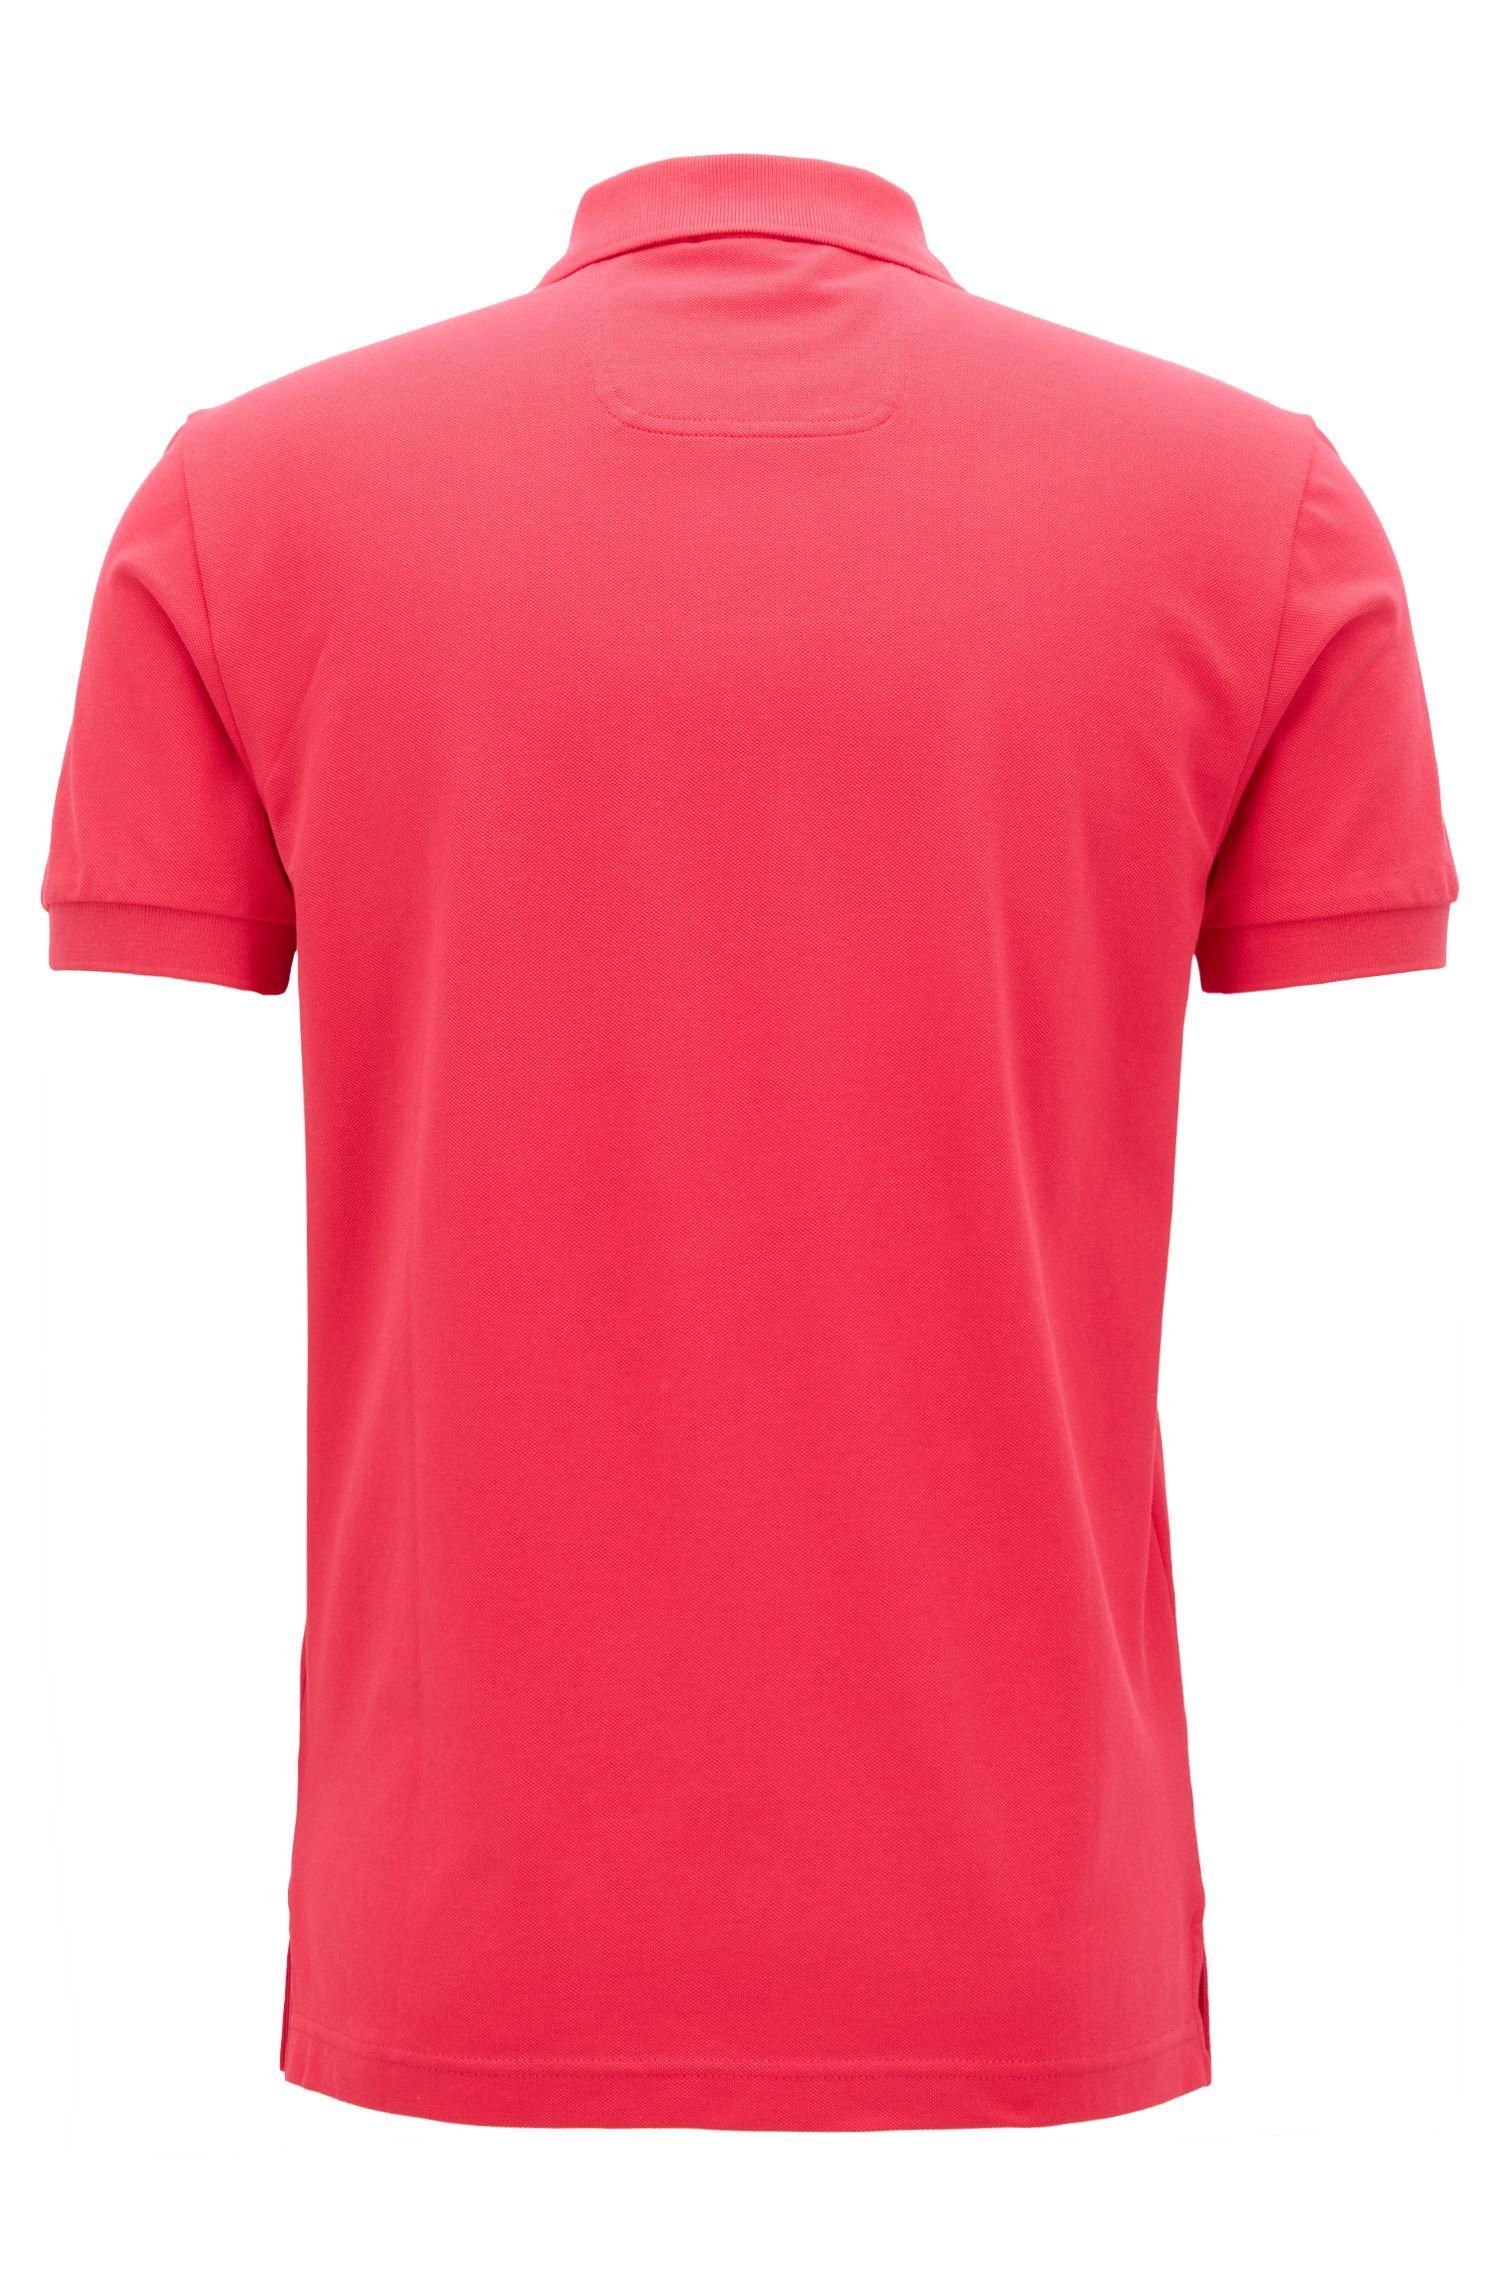 Poloshirt aus Pima-Baumwolle